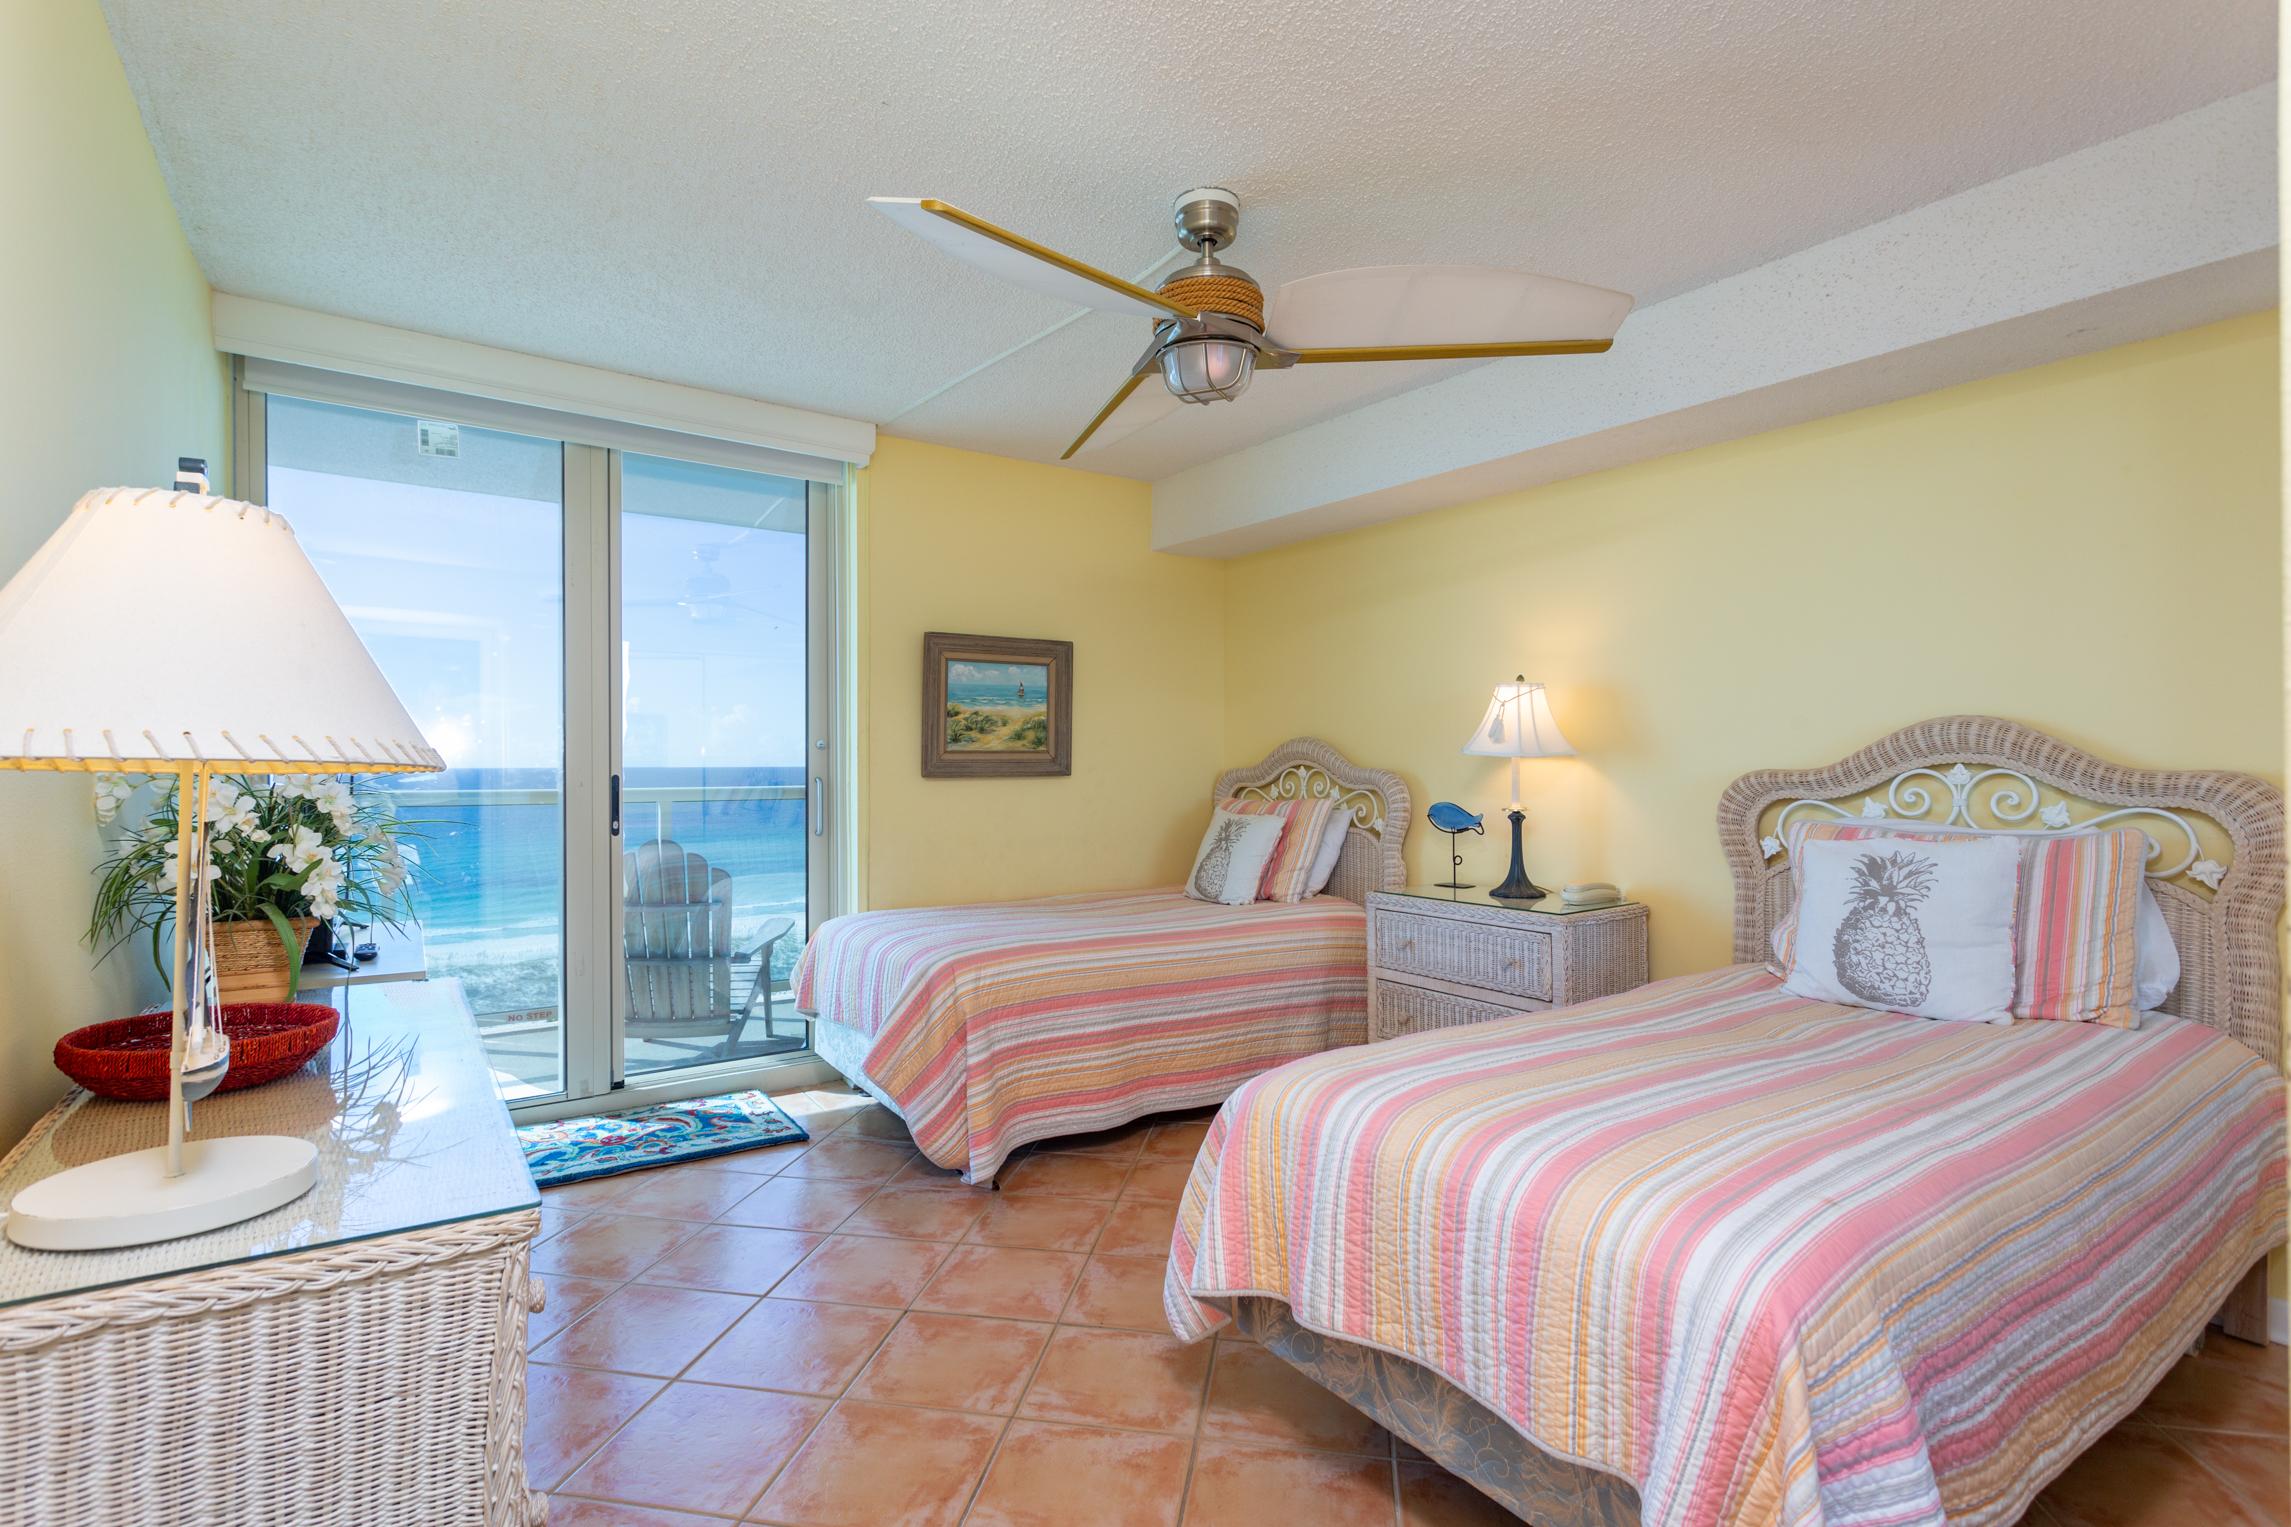 Sabine Yacht & Racquet Club #9D Condo rental in Sabine Yacht & Racquet Club ~ Pensacola Beach Condo Rentals by BeachGuide in Pensacola Beach Florida - #14